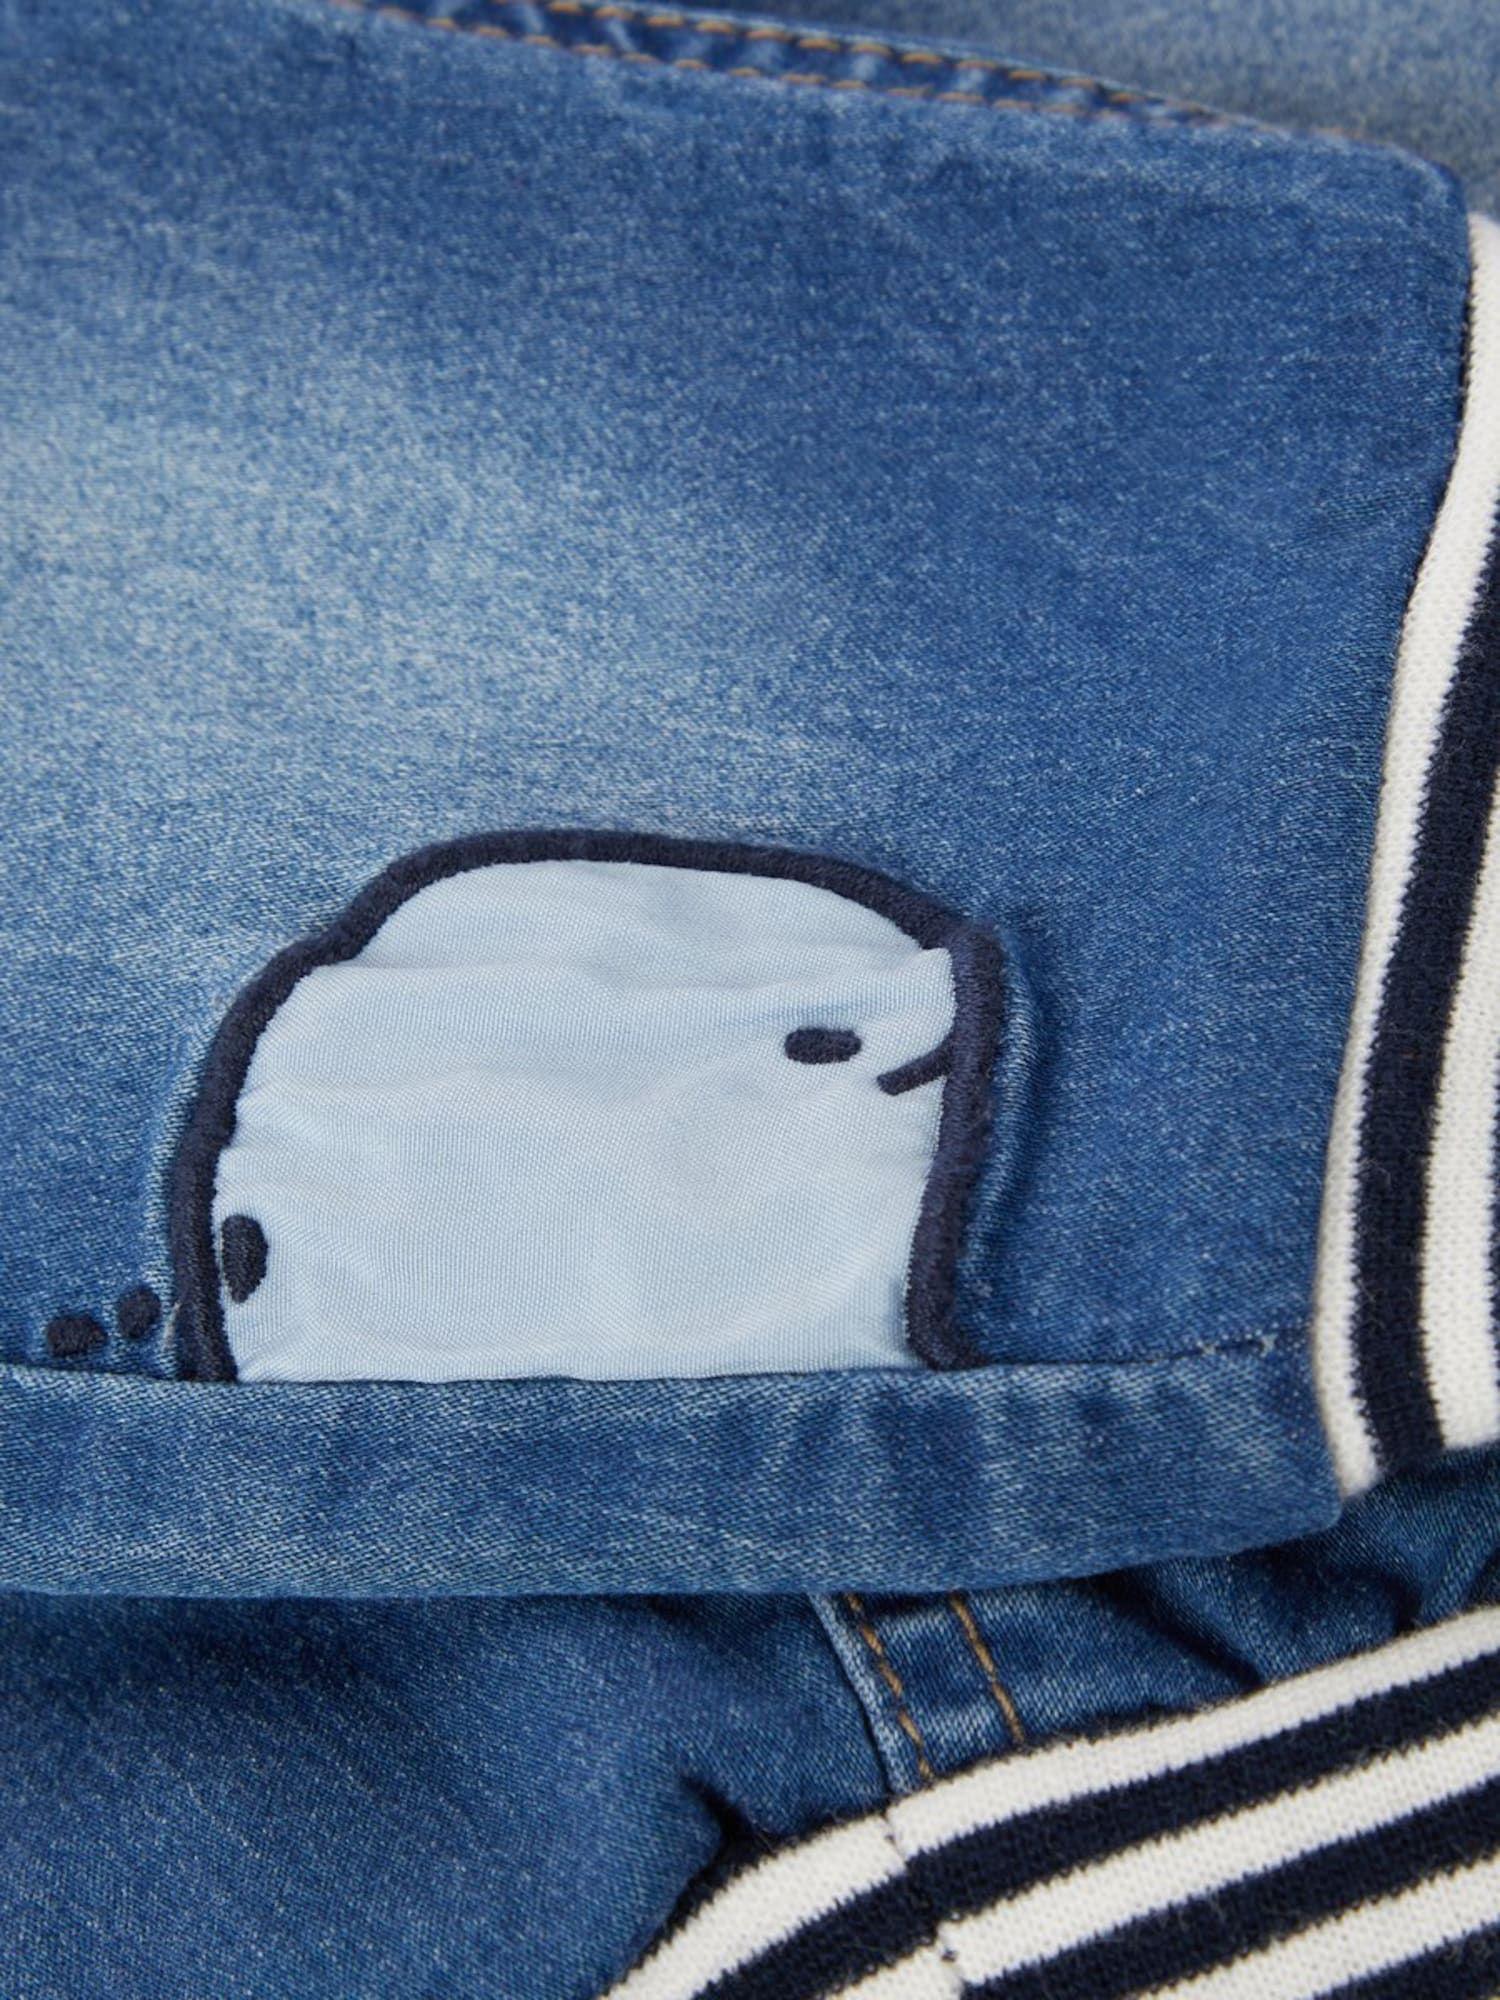 Name It Jeans Jungen Blue Denim Schwarz Weiss Grosse 56 Schwarz Weiss Jeans